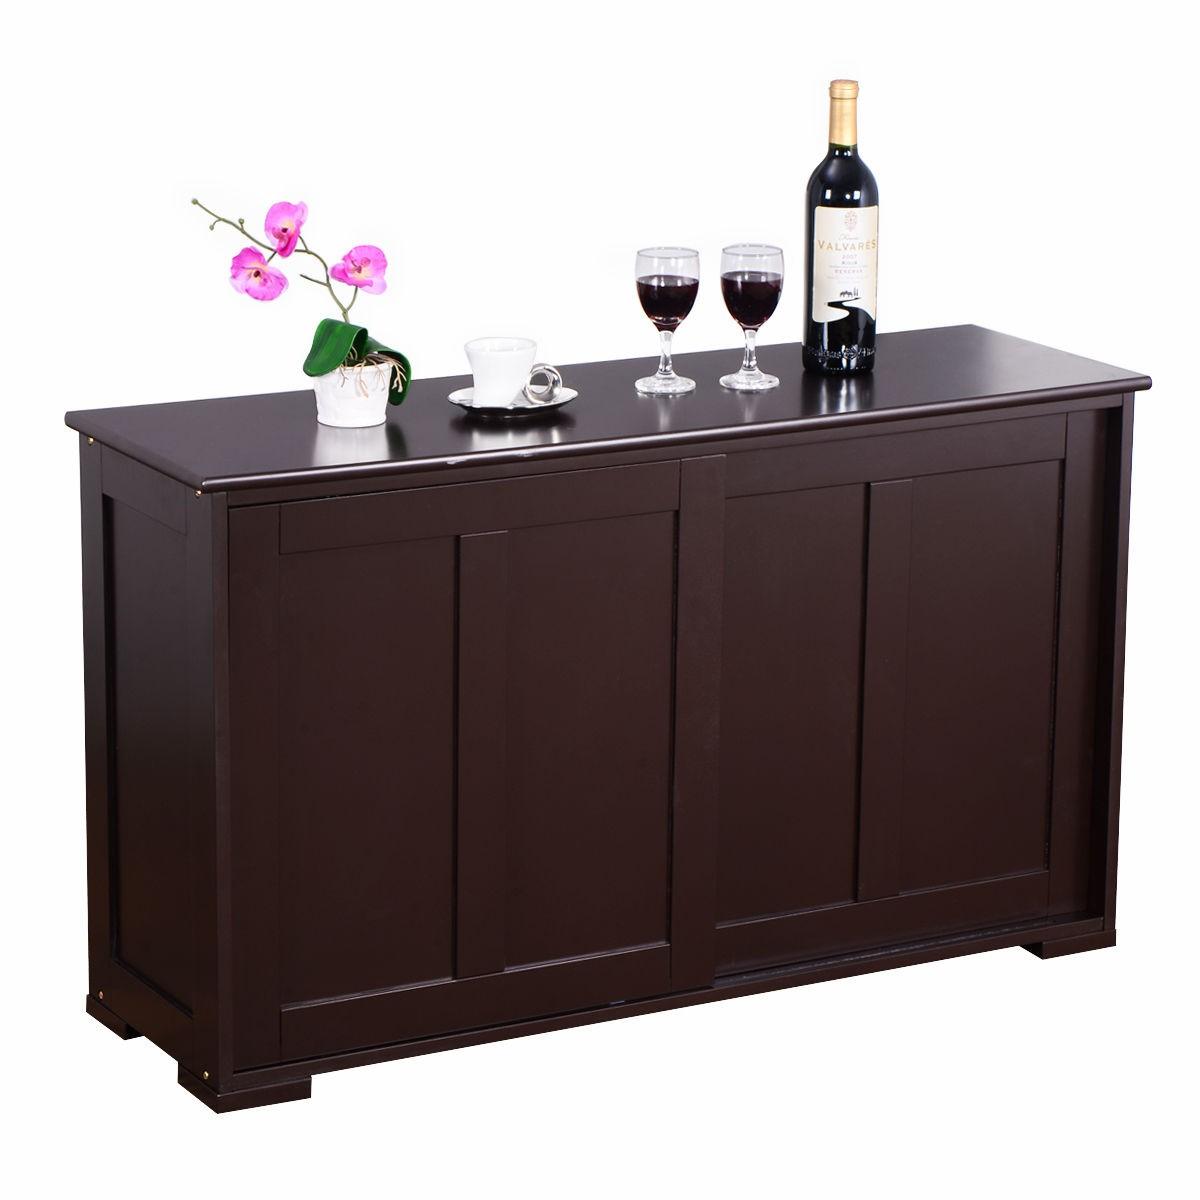 Costway Kitchen Storage Cabinet With Wood Sliding Door 7195